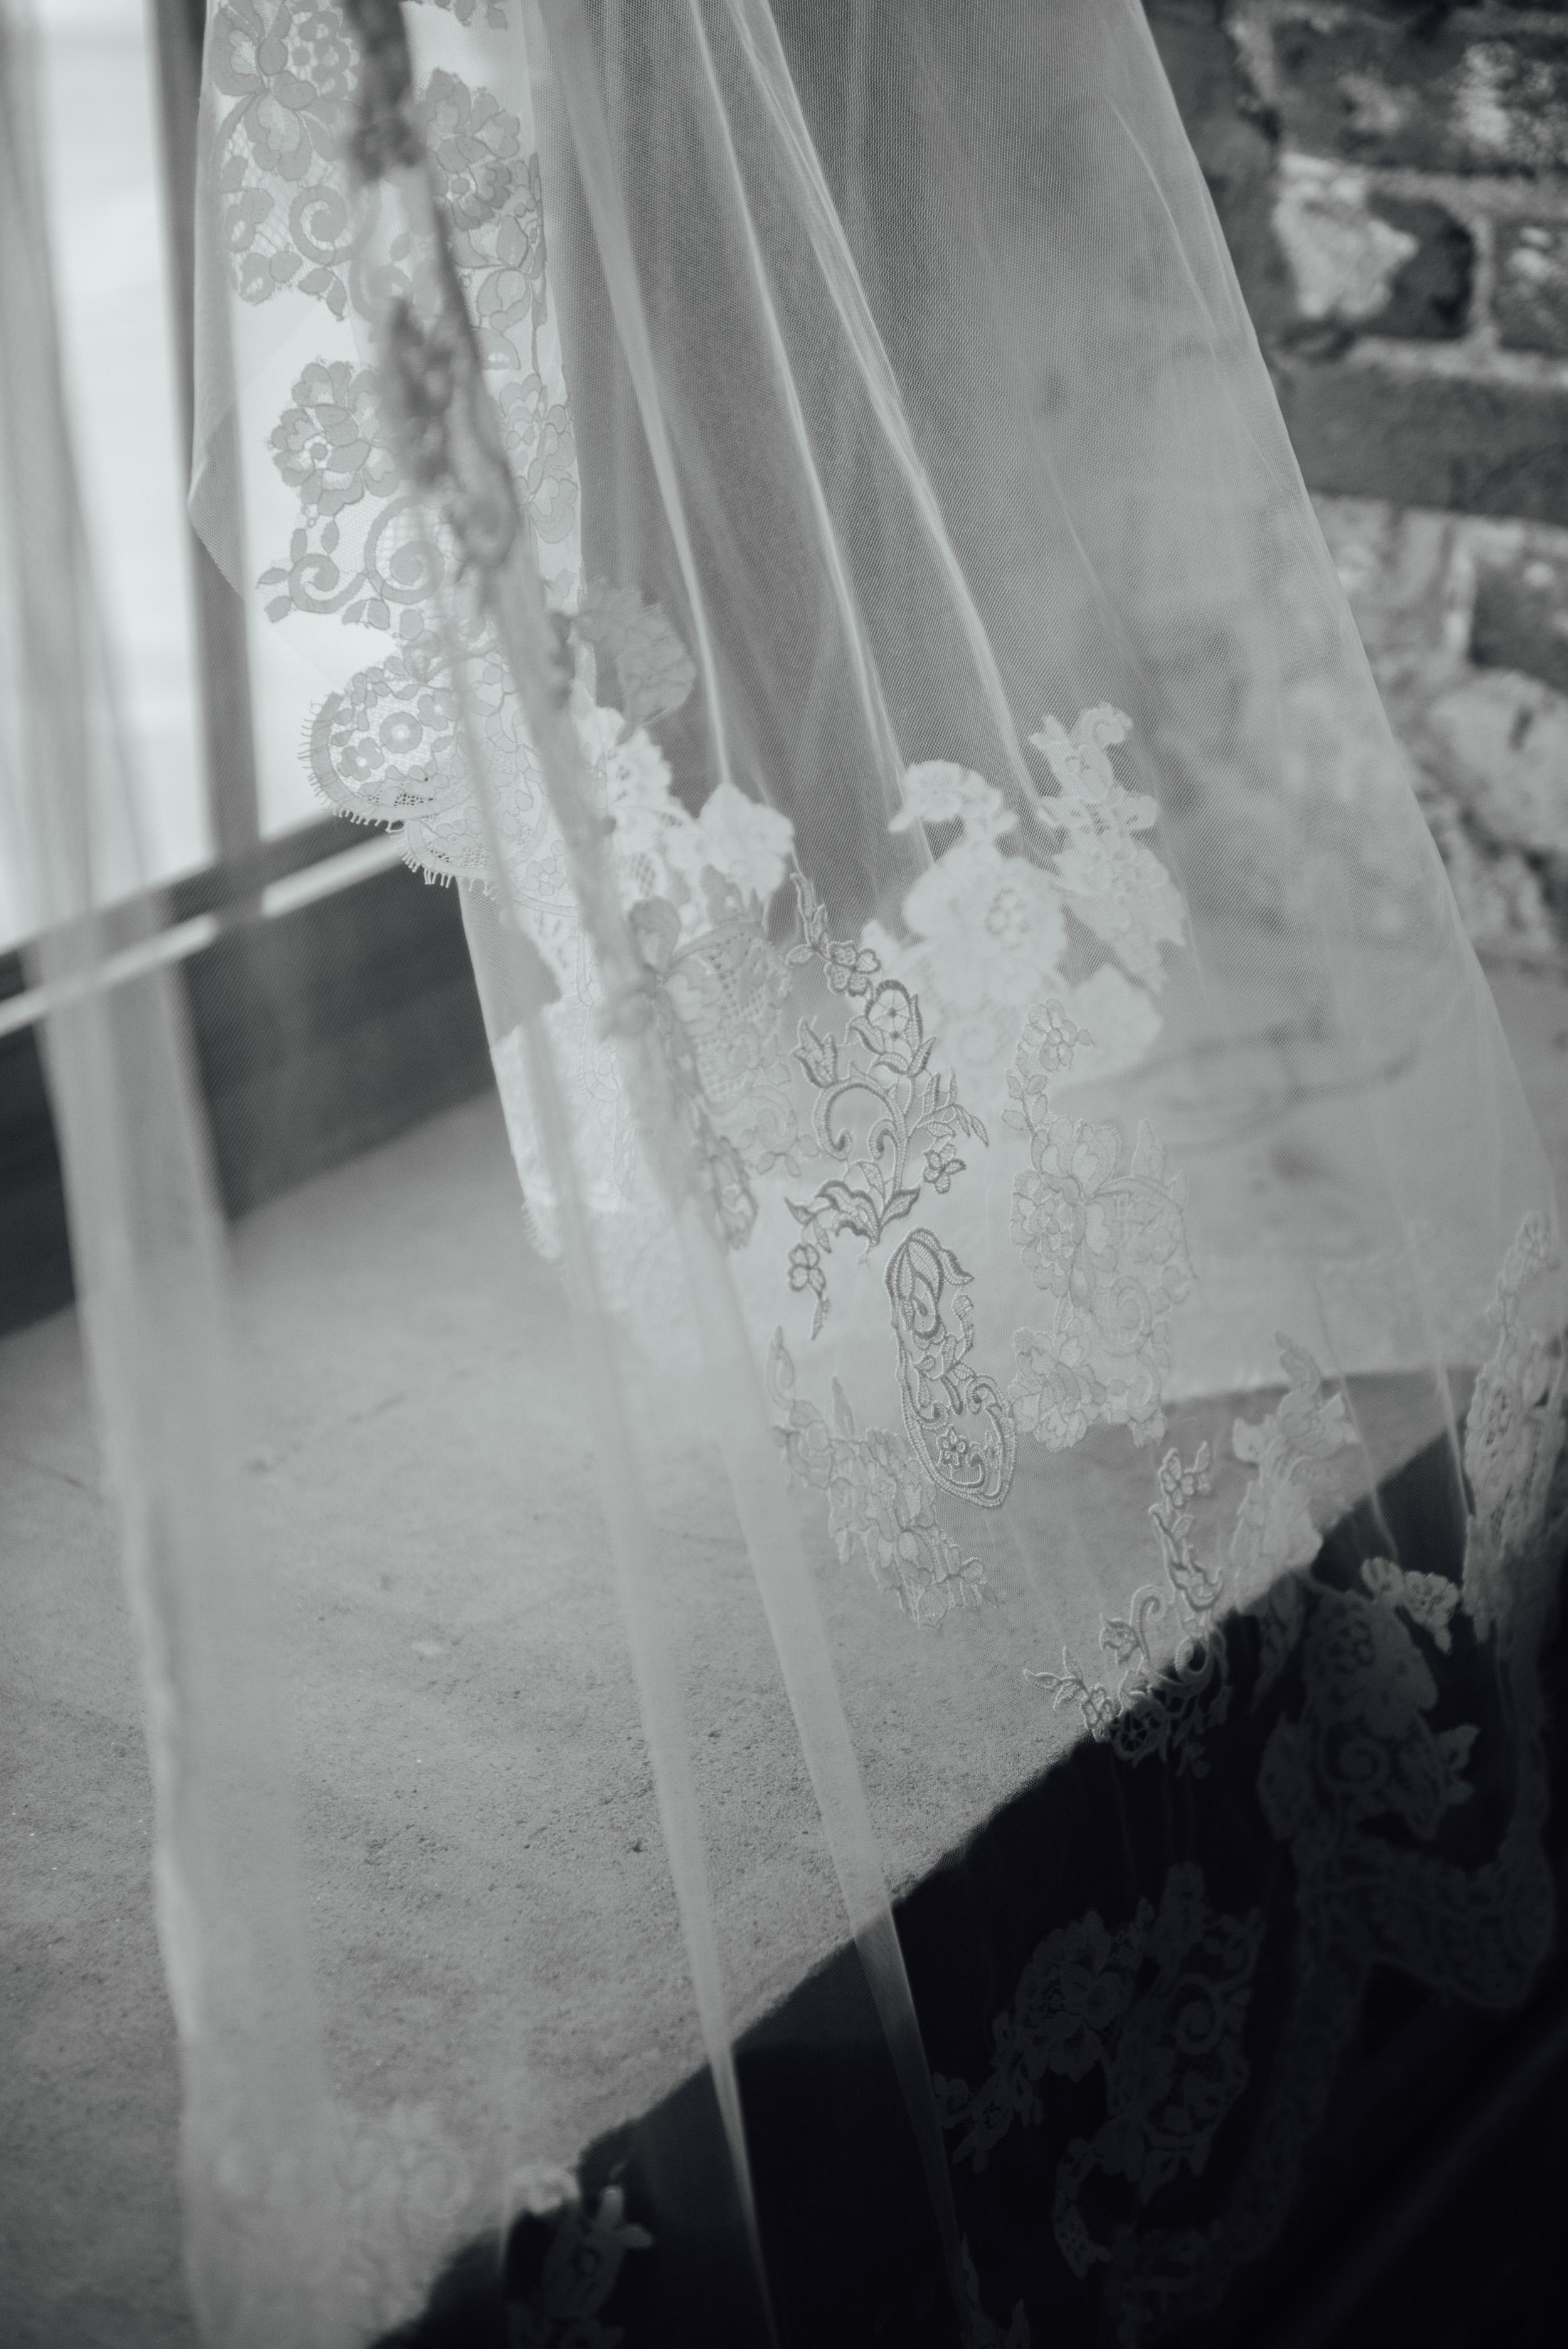 cleland-studios-wedding-photography-4.jpg